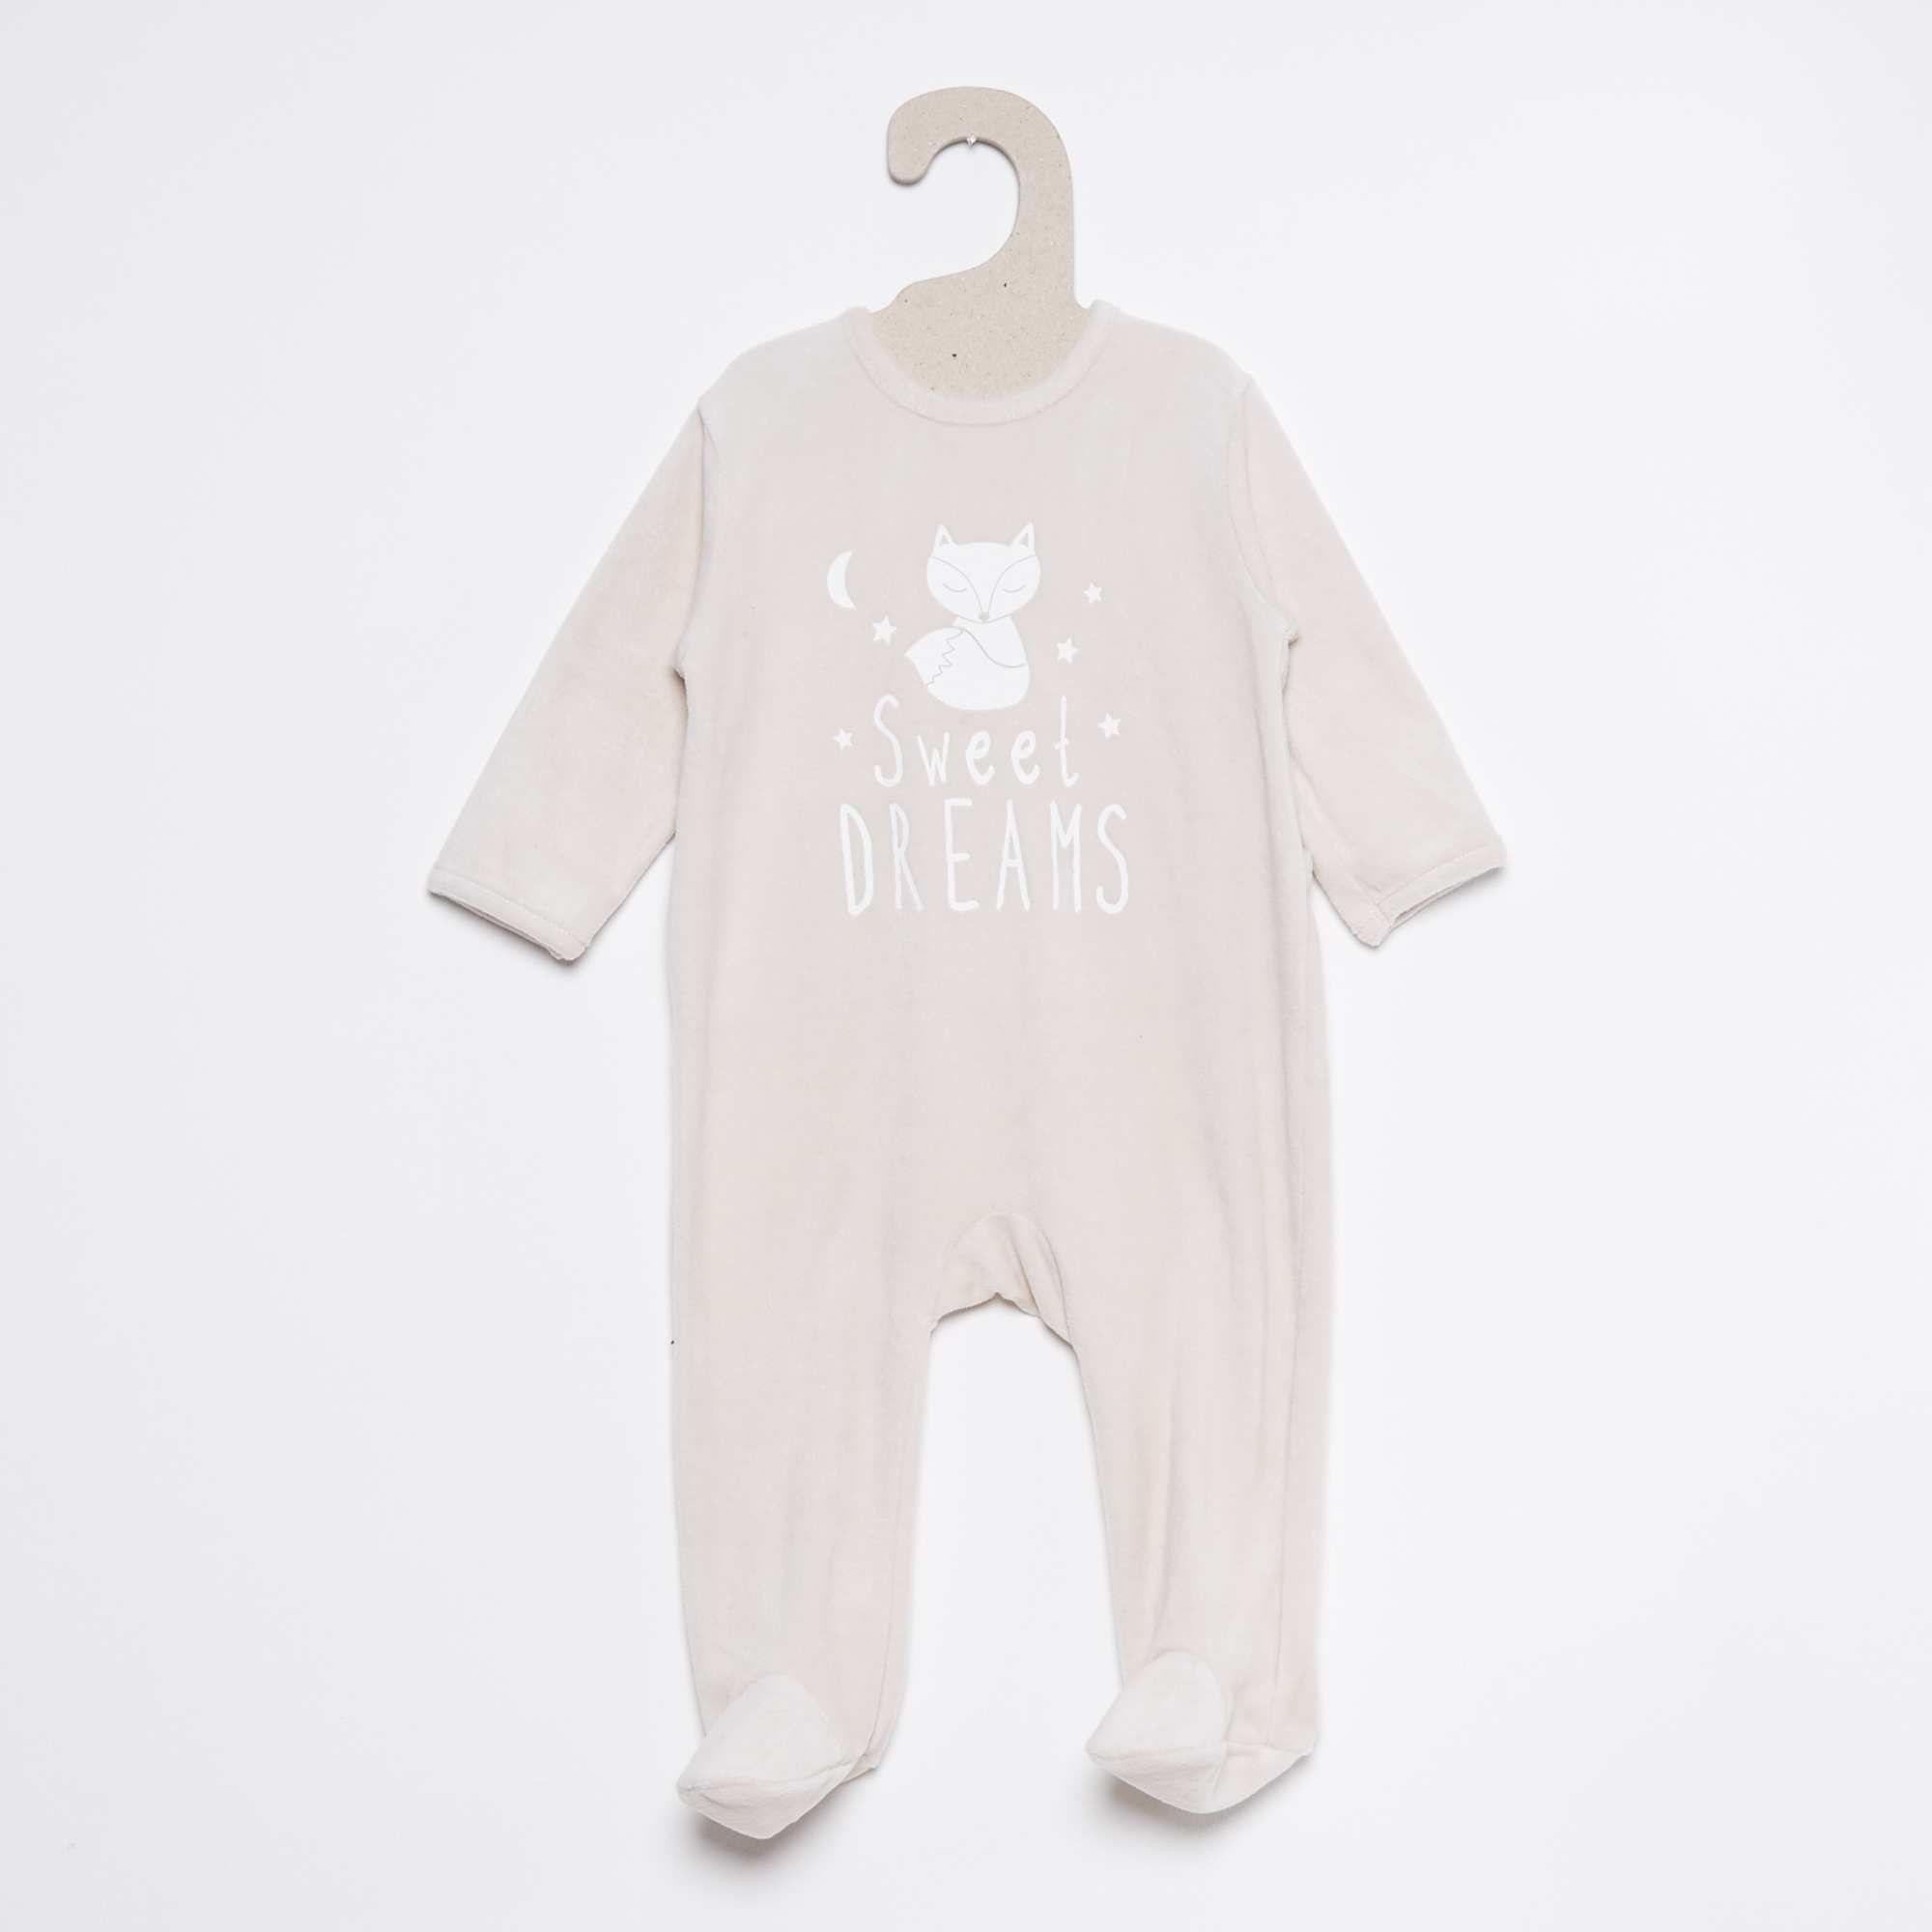 8011a42006df6 Pyjama en velours imprimé Bébé garçon - Kiabi - 4